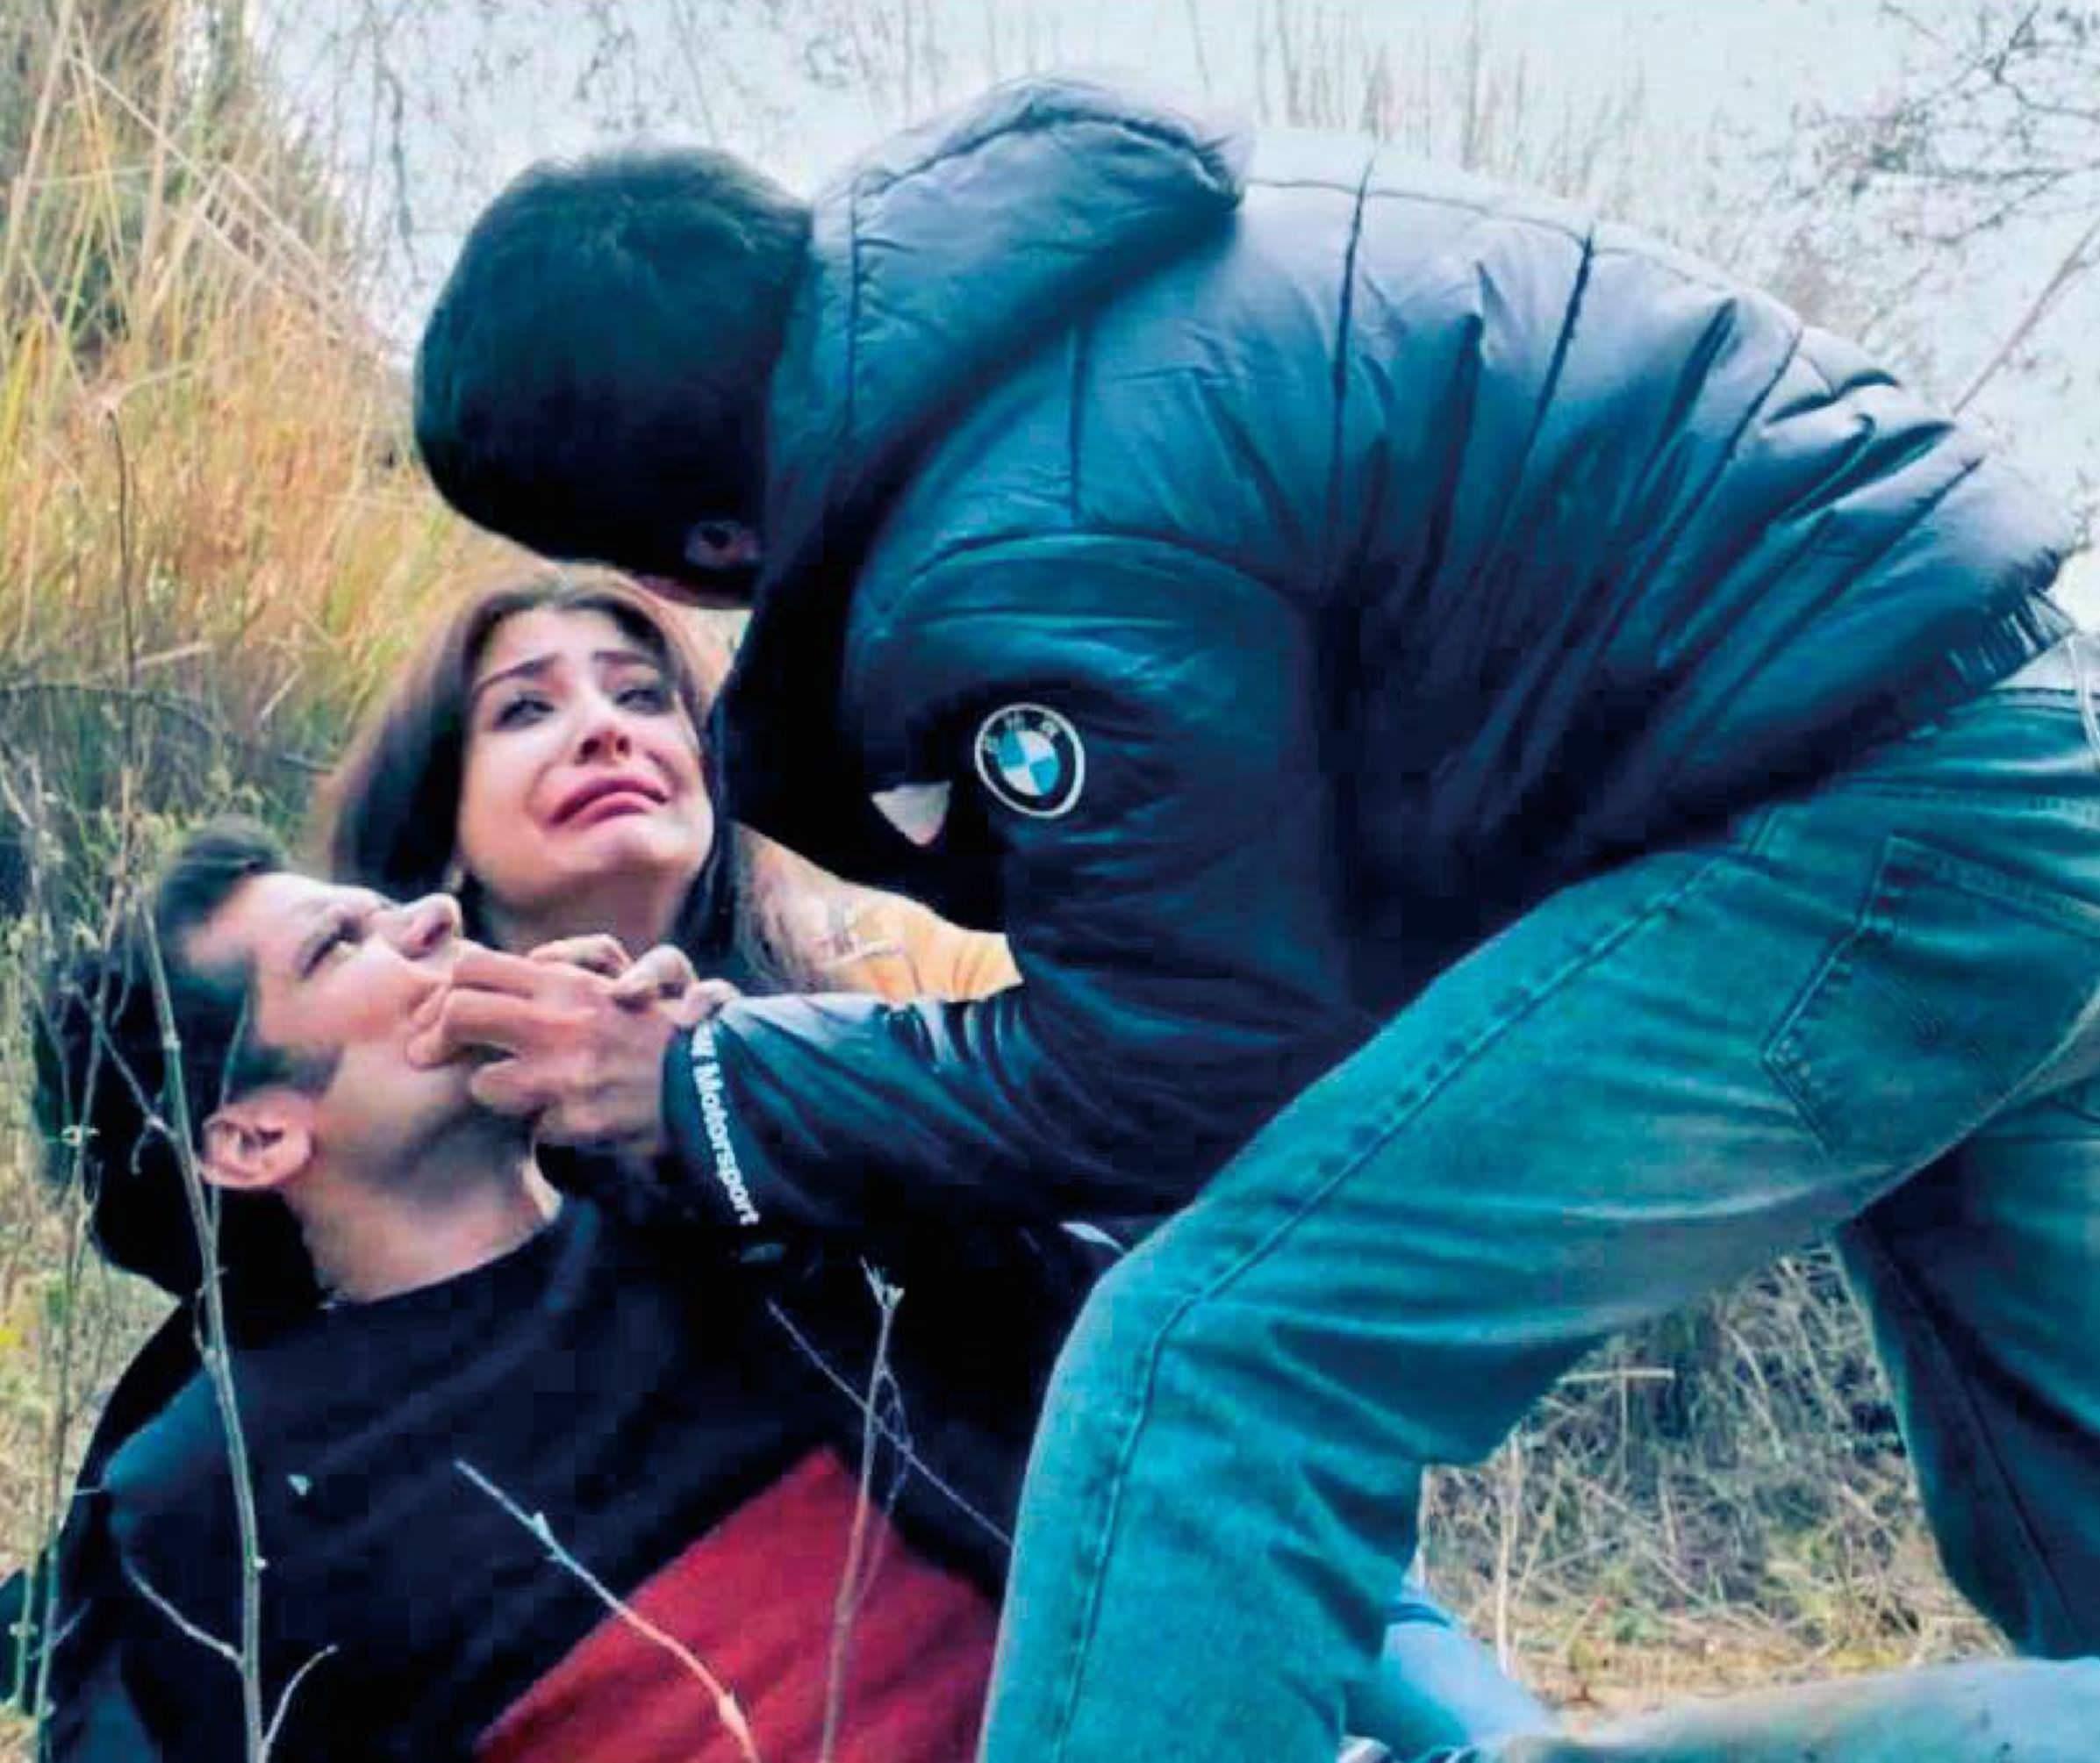 Feminism à la Bollywood!